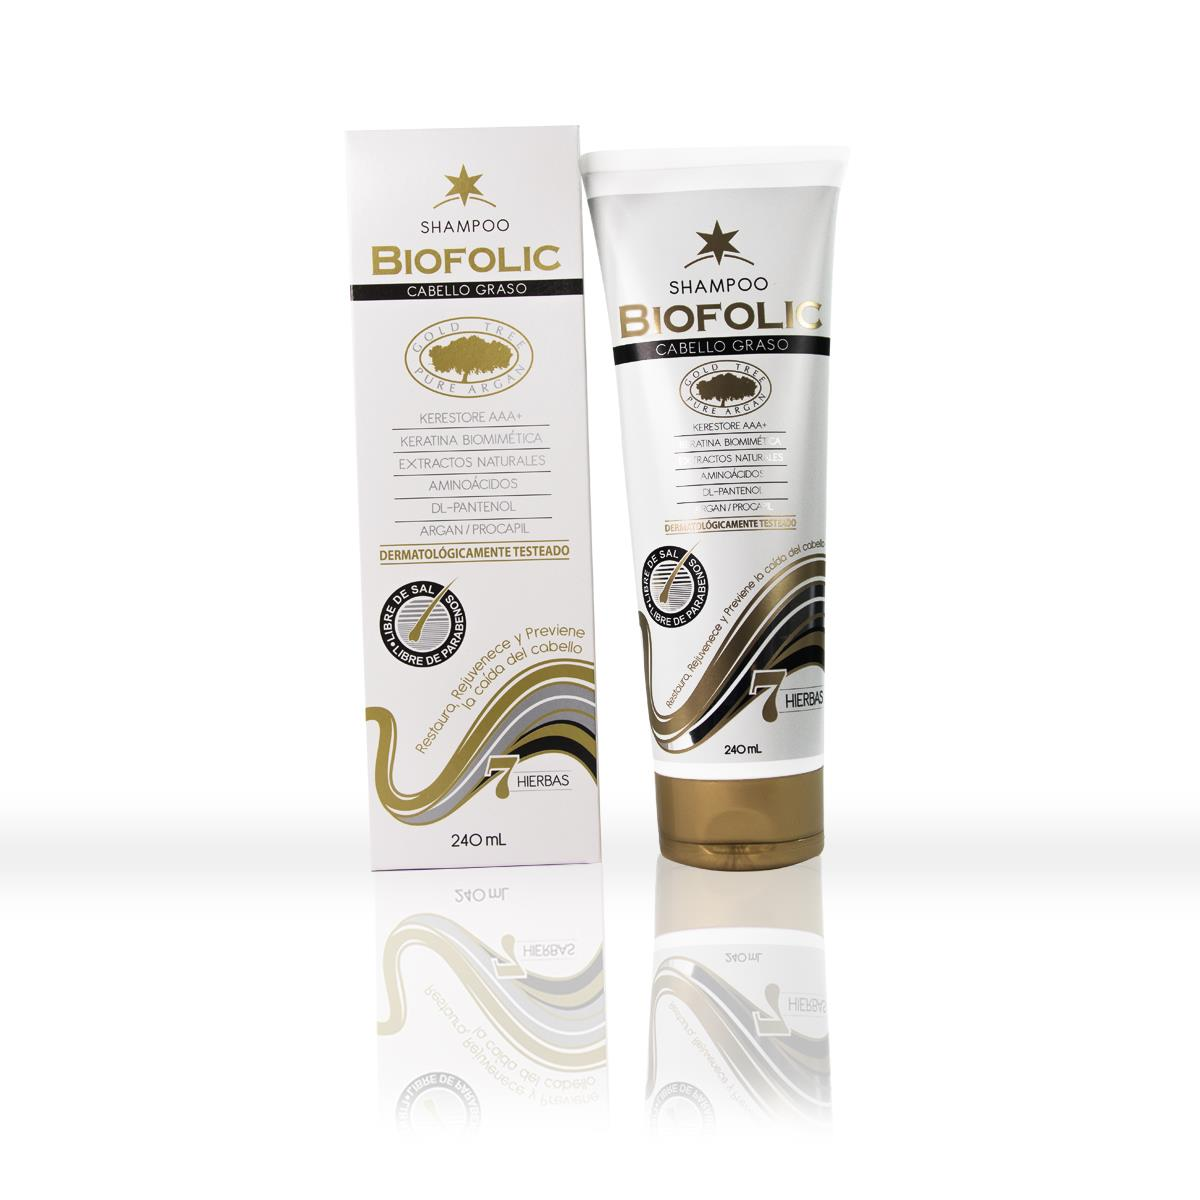 Shampoo Biofolic Graso 240 Ml